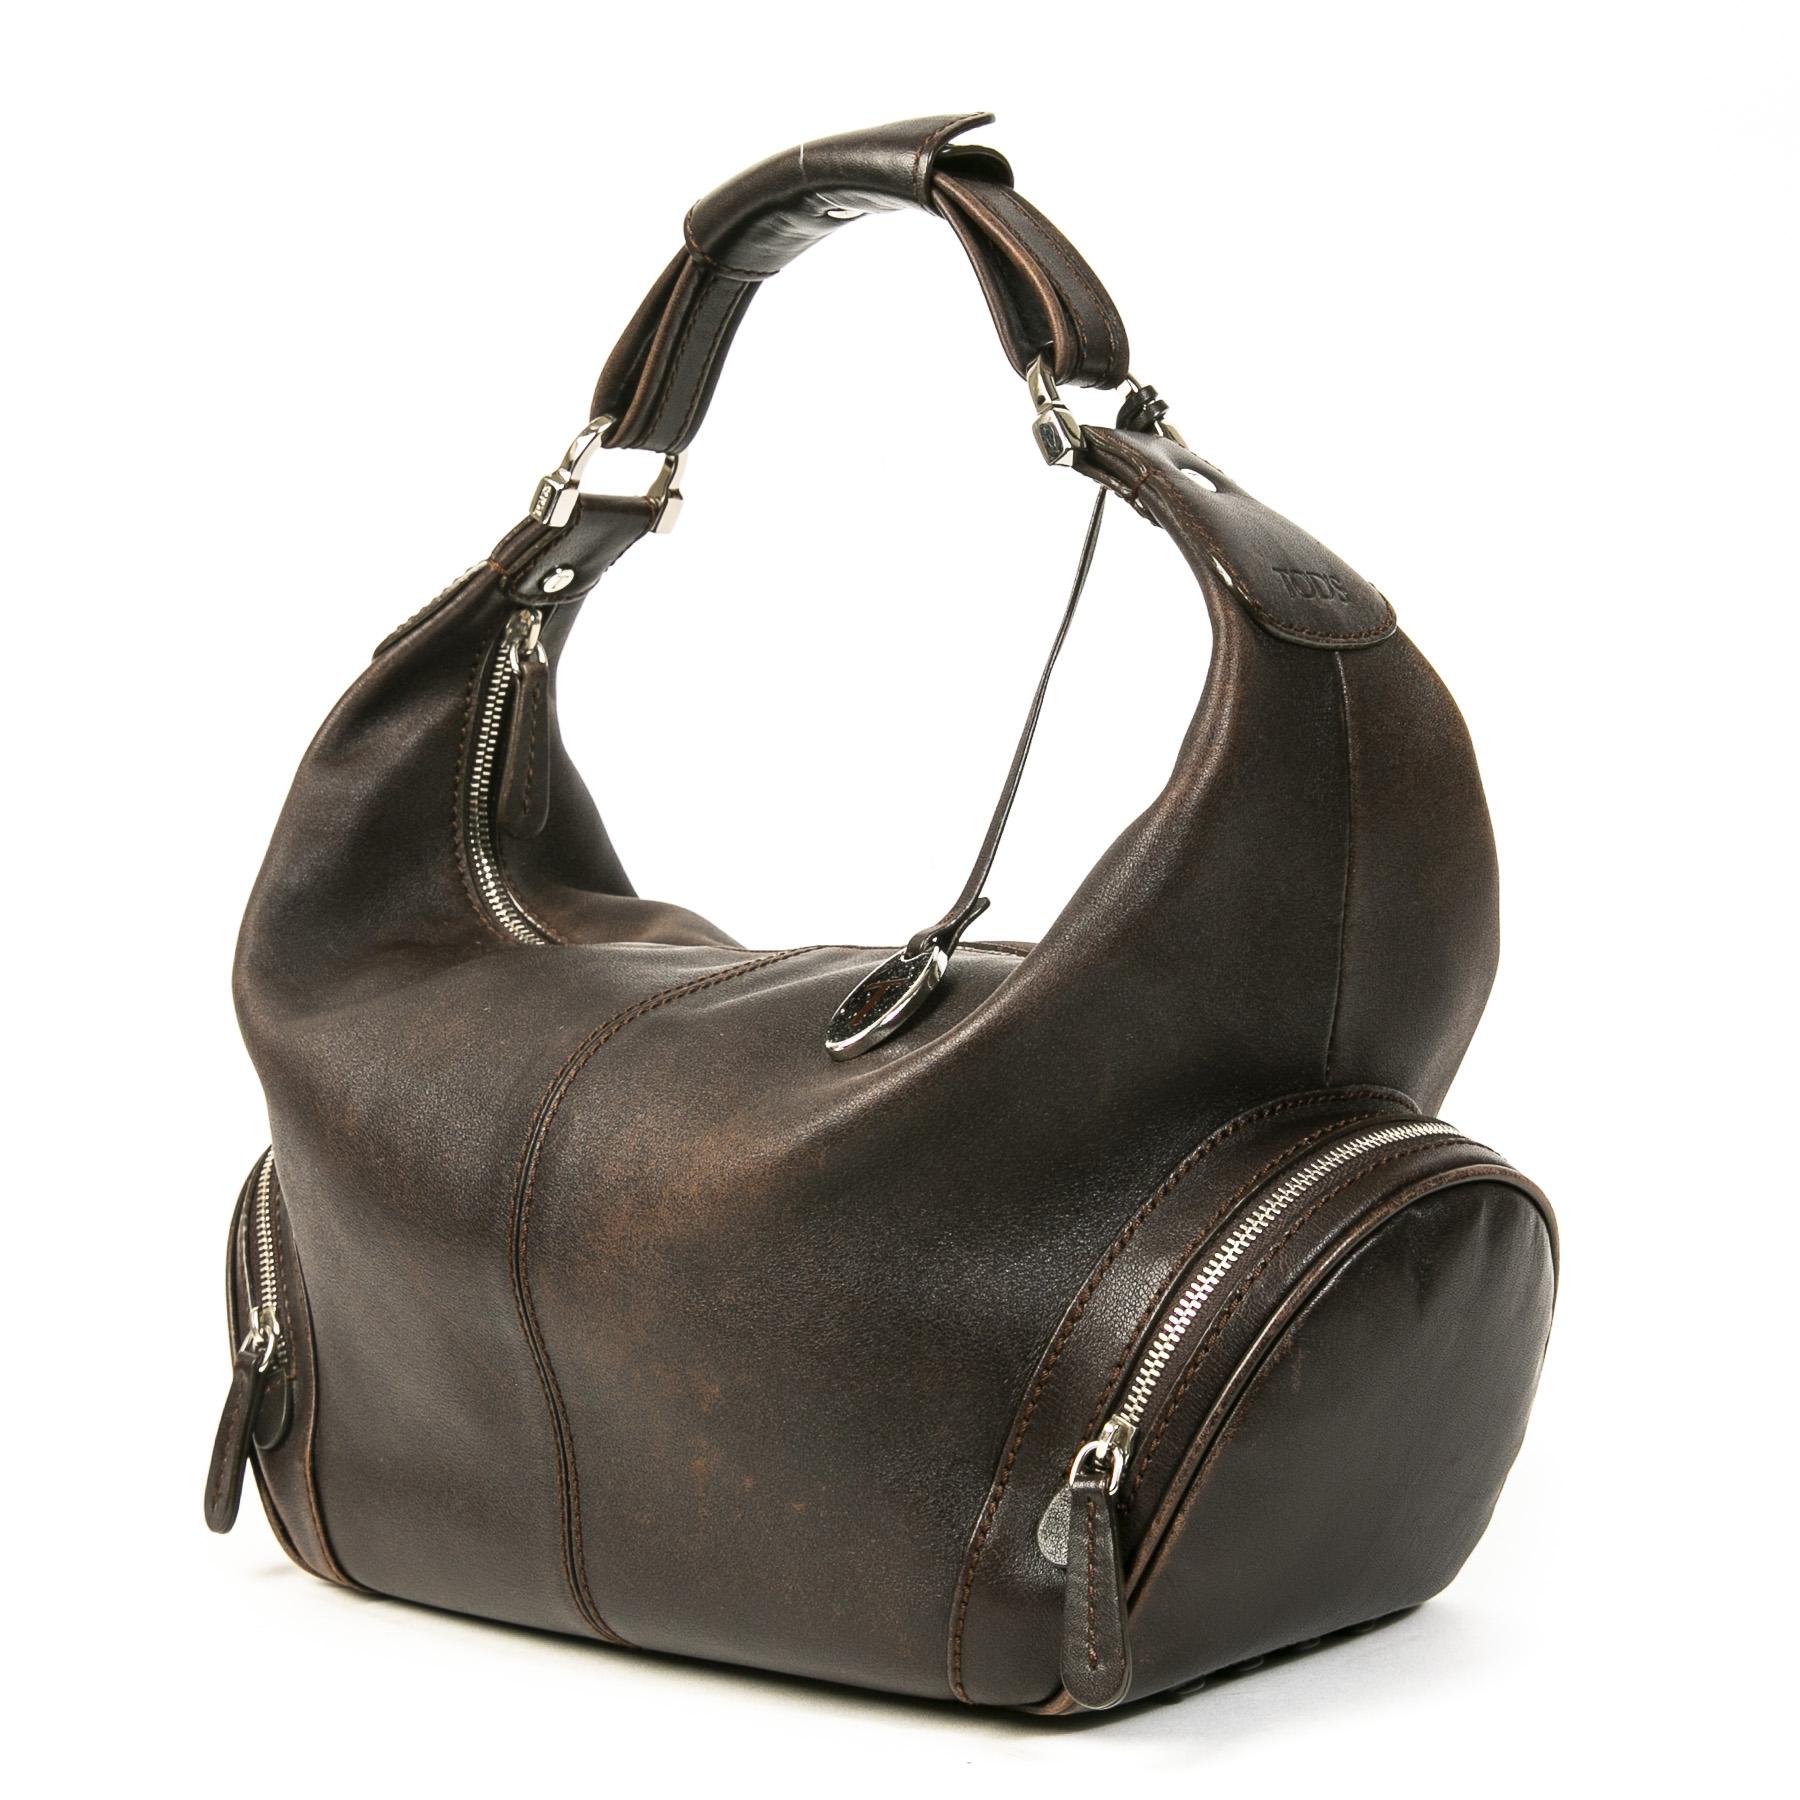 Authentieke tweedehands vintage Tods Brown Hobo Bag koop online webshop LabelLOV